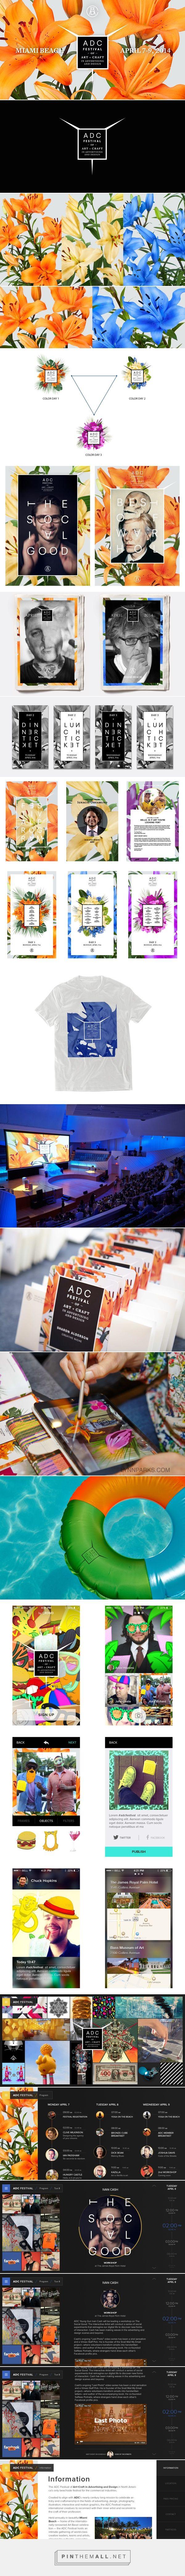 Art Directors Club Festival Campaign on Behance